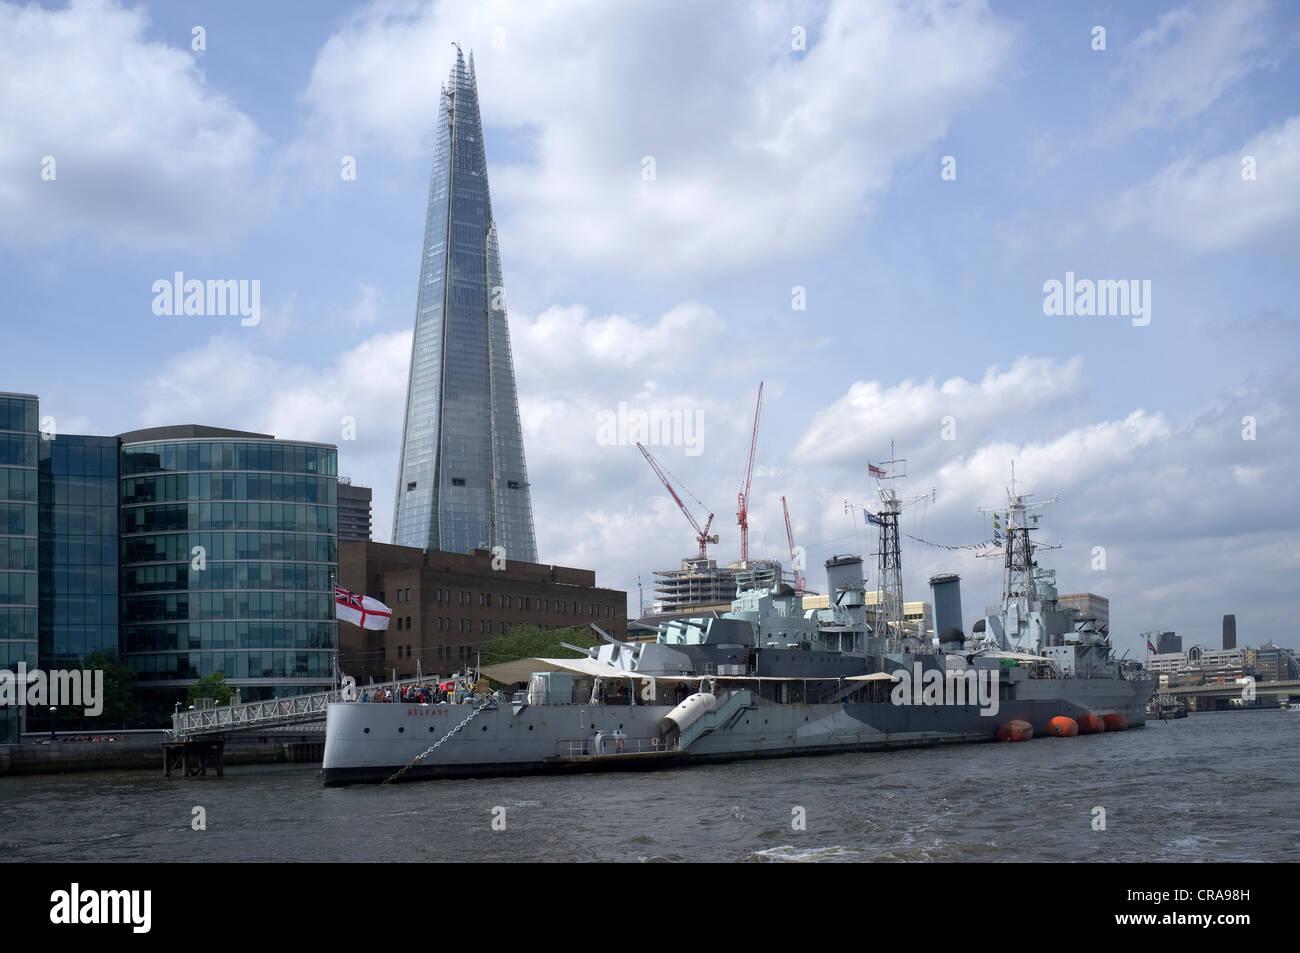 HMS Belfast Moored alongside Shard of Glass between London Bridge and Tower Bridge -1 - Stock Image